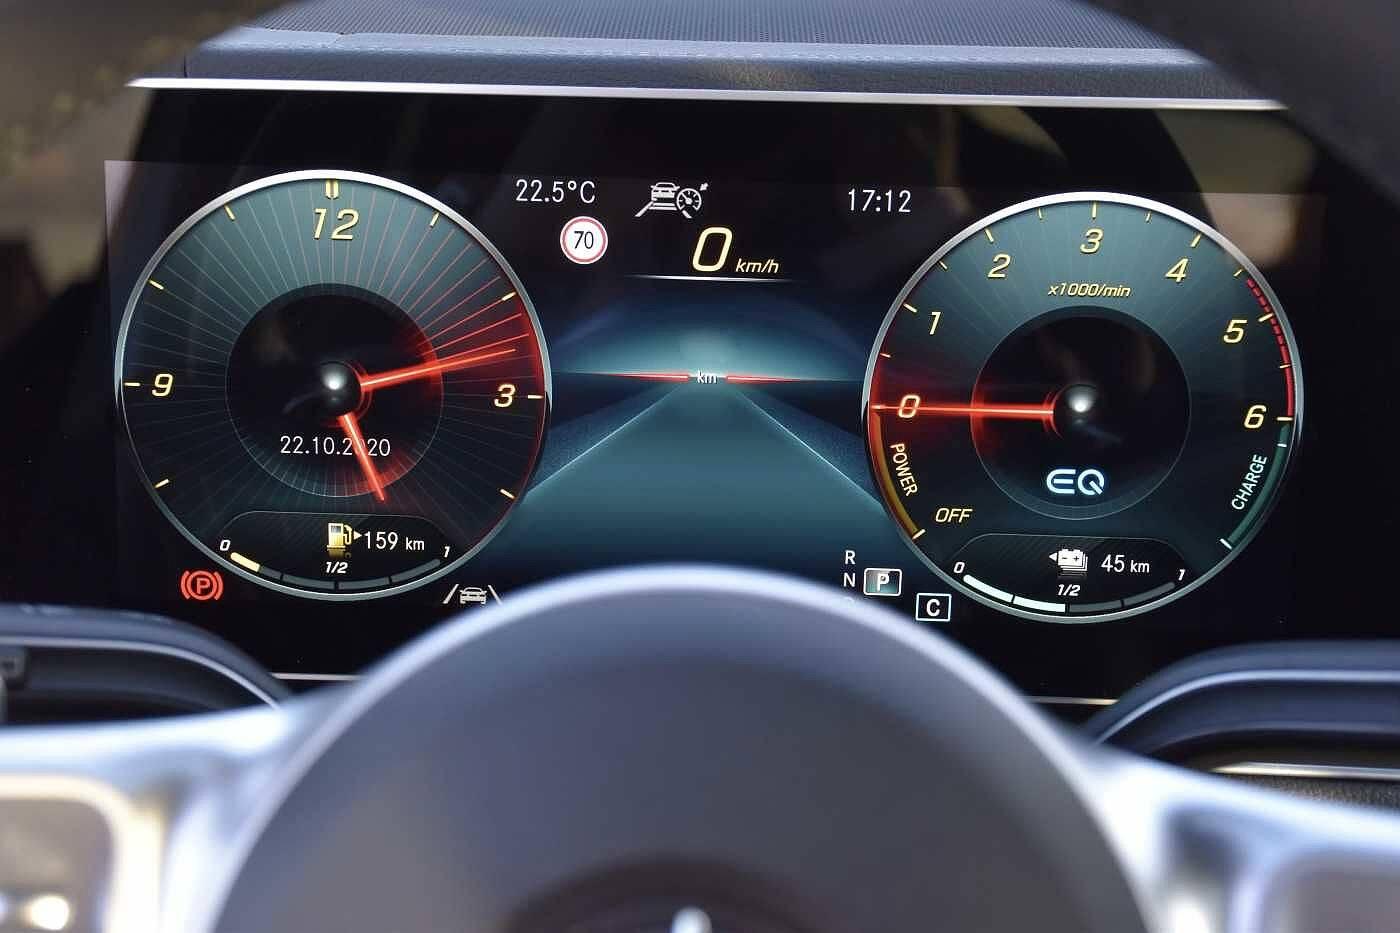 Mercedes GLE 350 De Hybride New Model AMG Panorama 21'